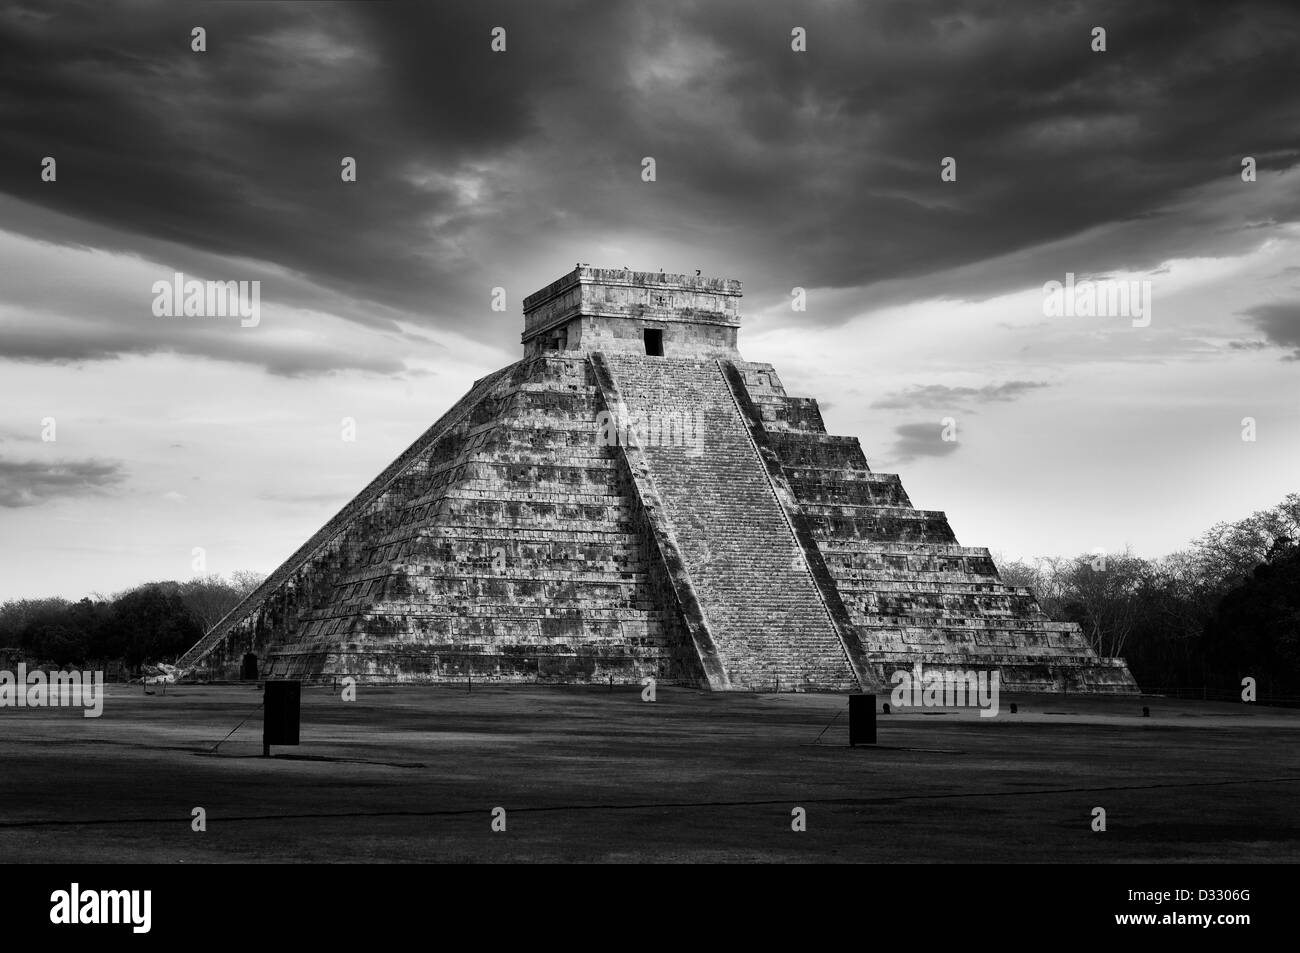 Pirámide maya en Chitcen Itza, México Imagen De Stock